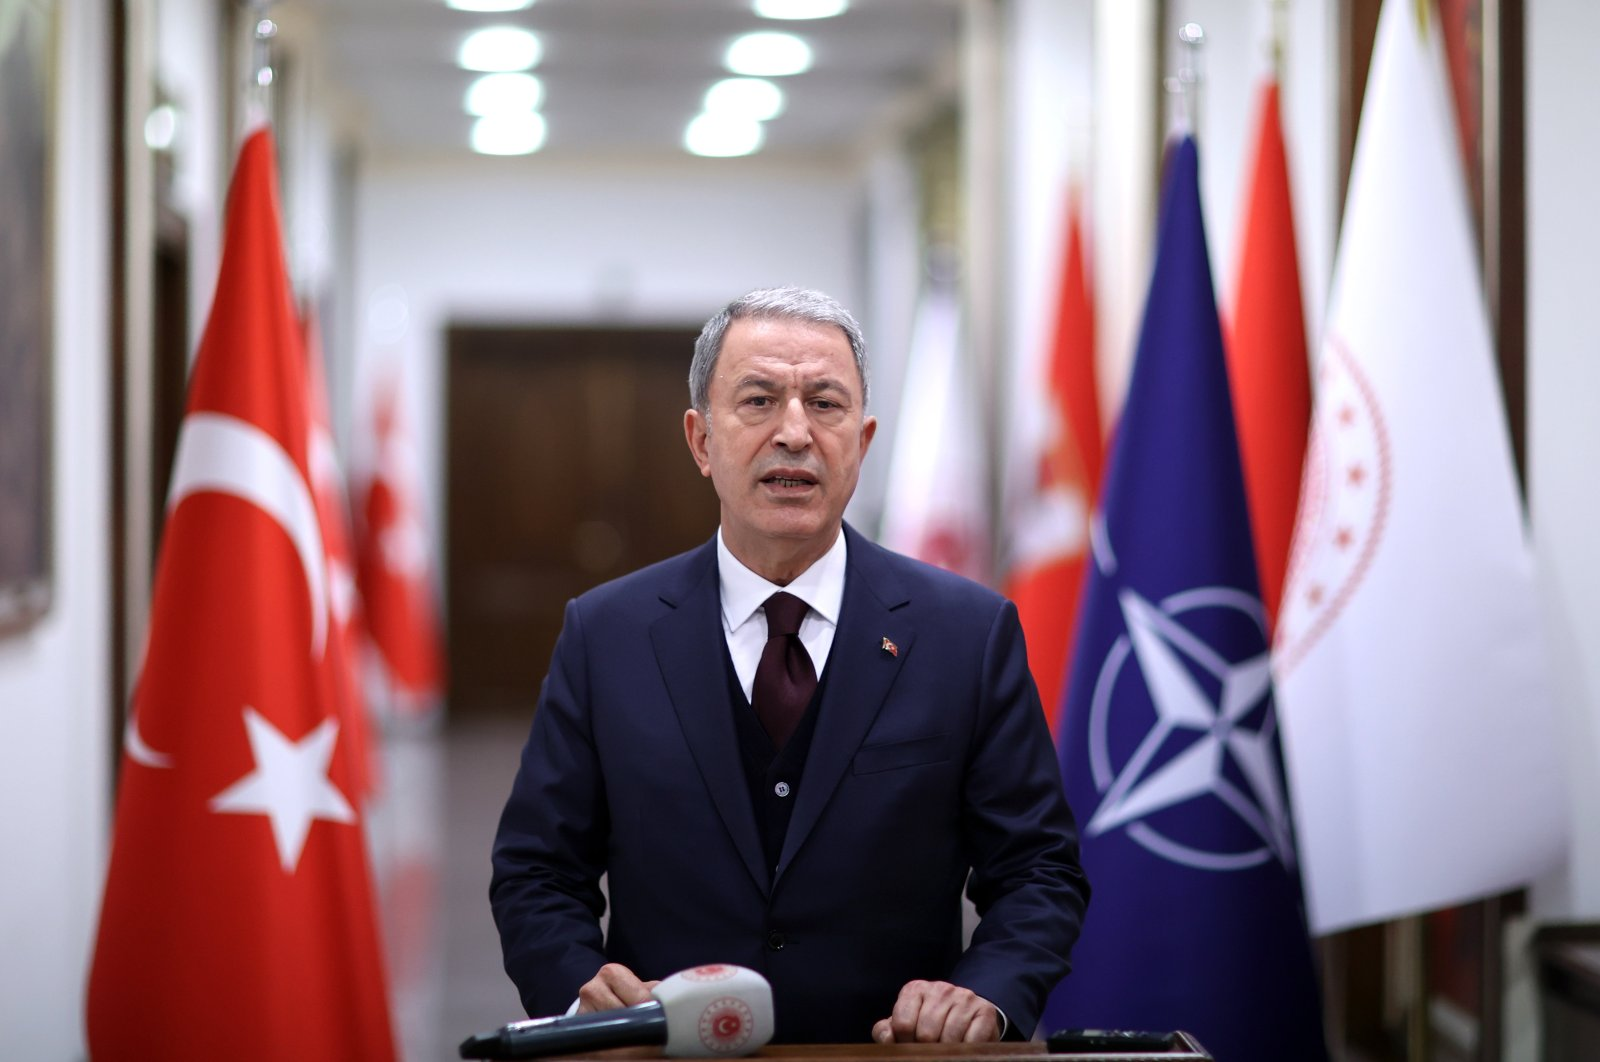 Turkey's Defense Minister Hulusi Akar holding a press conference after the NATO meeting, Ankara, Turkey, Feb. 18, 2021. (AA Photo)